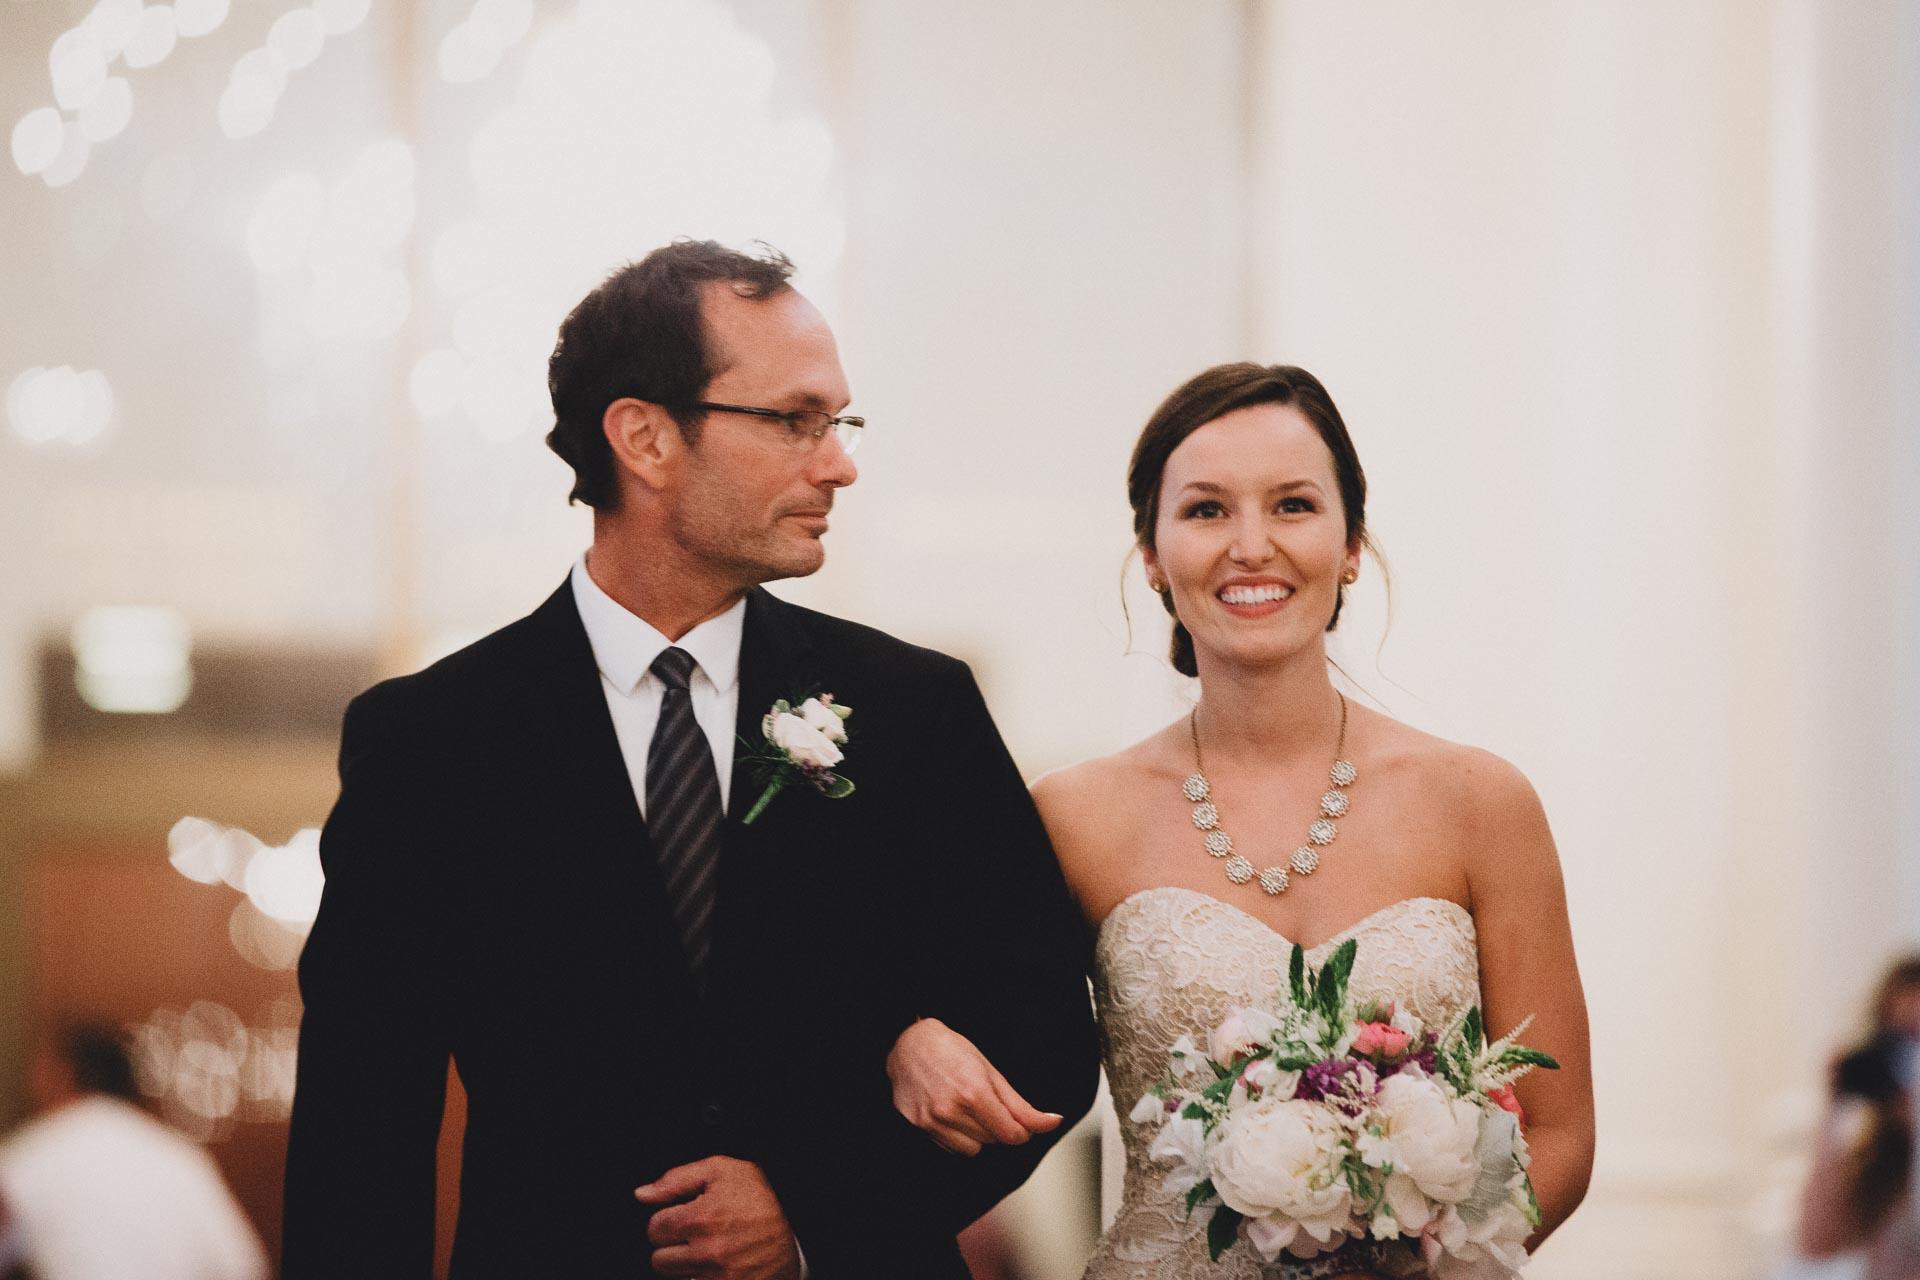 Julia-Michael-Cincinnati-Music-Hall-Wedding-099@2x.jpg